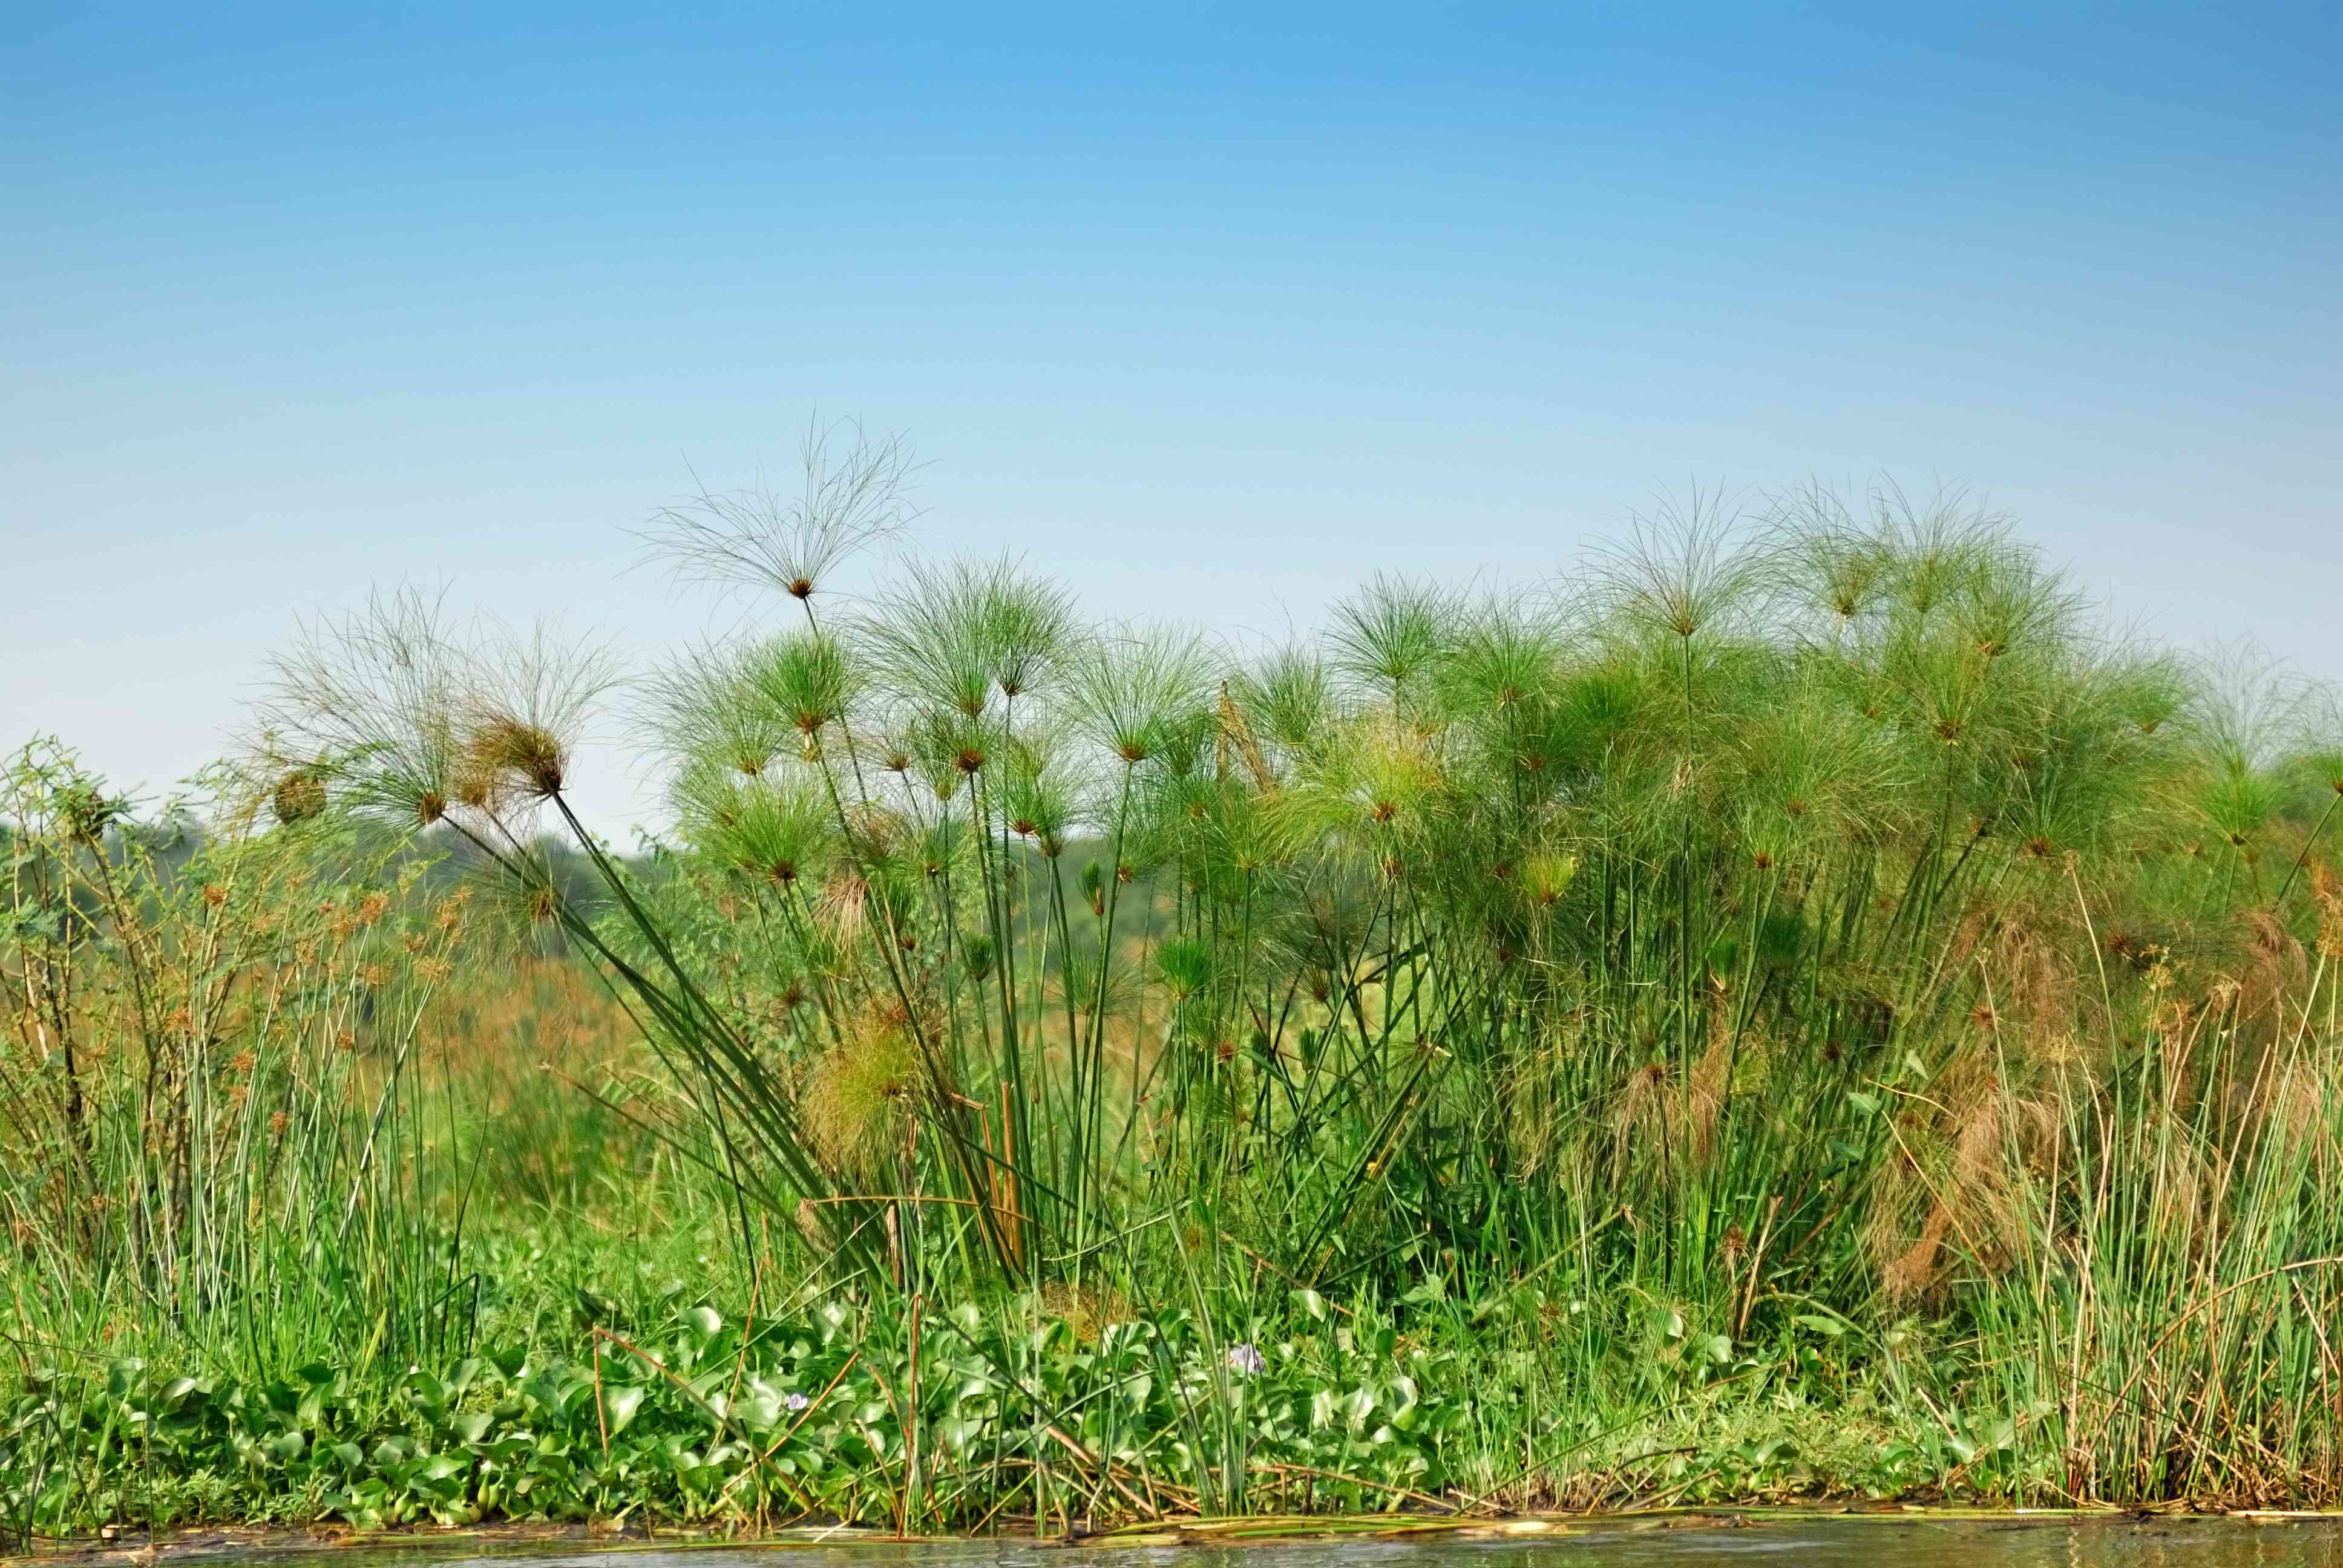 papyrus plant on the Nile River, Uganda